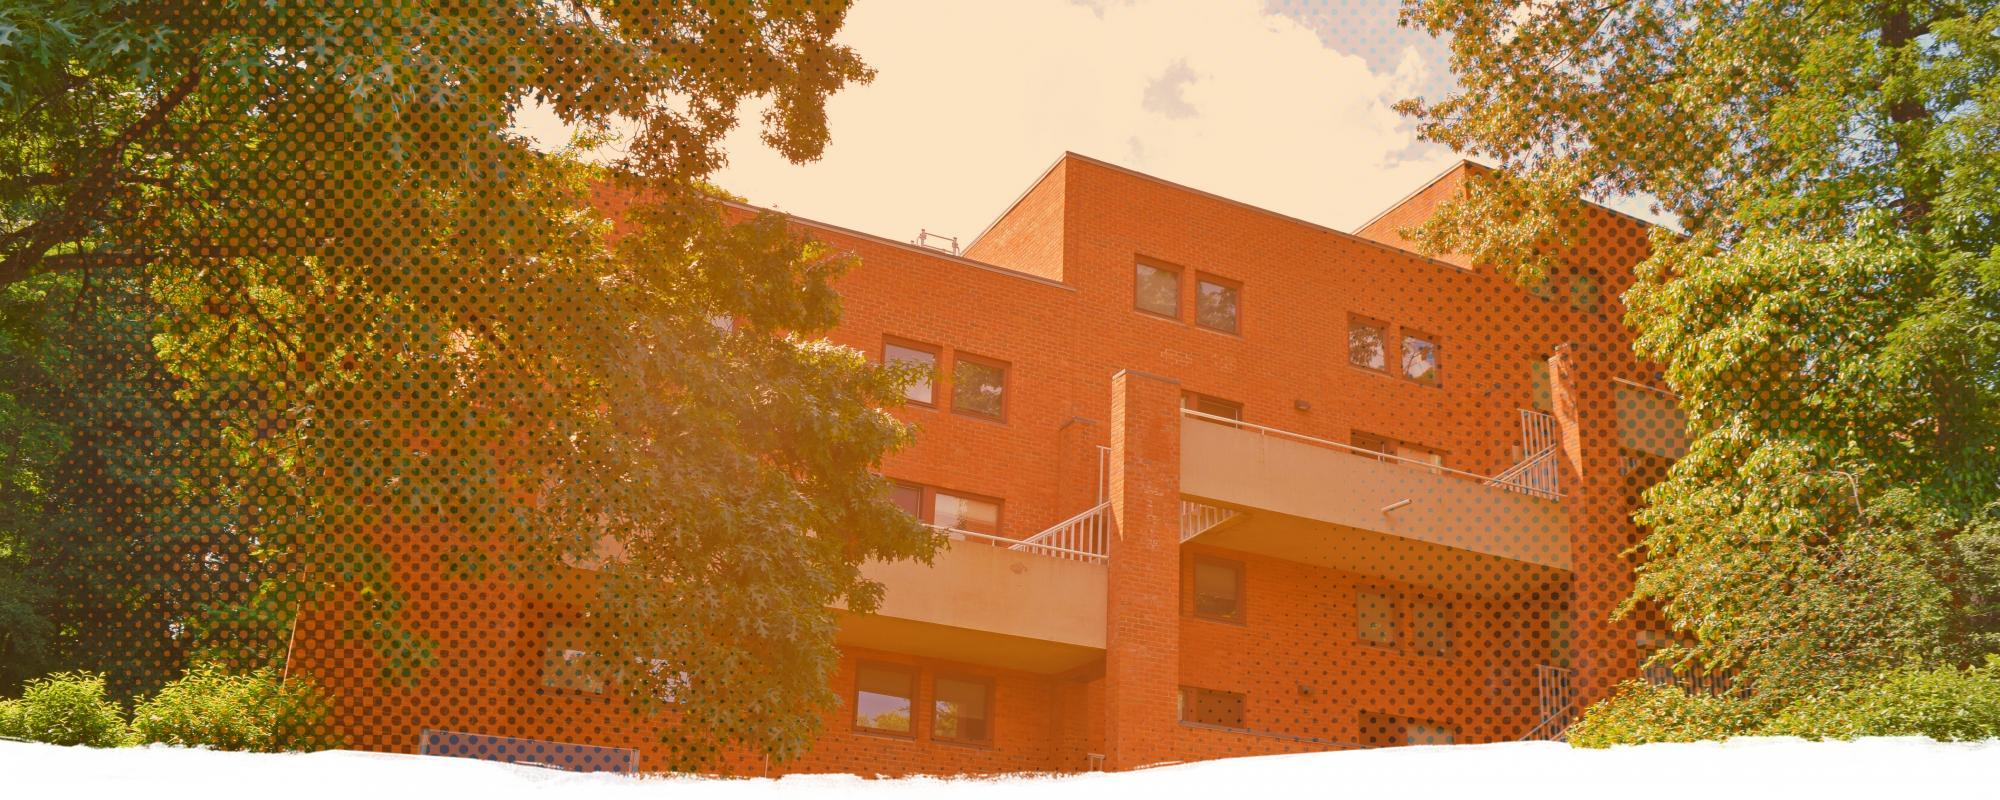 Gooch/Dillard Suite-Style Residences